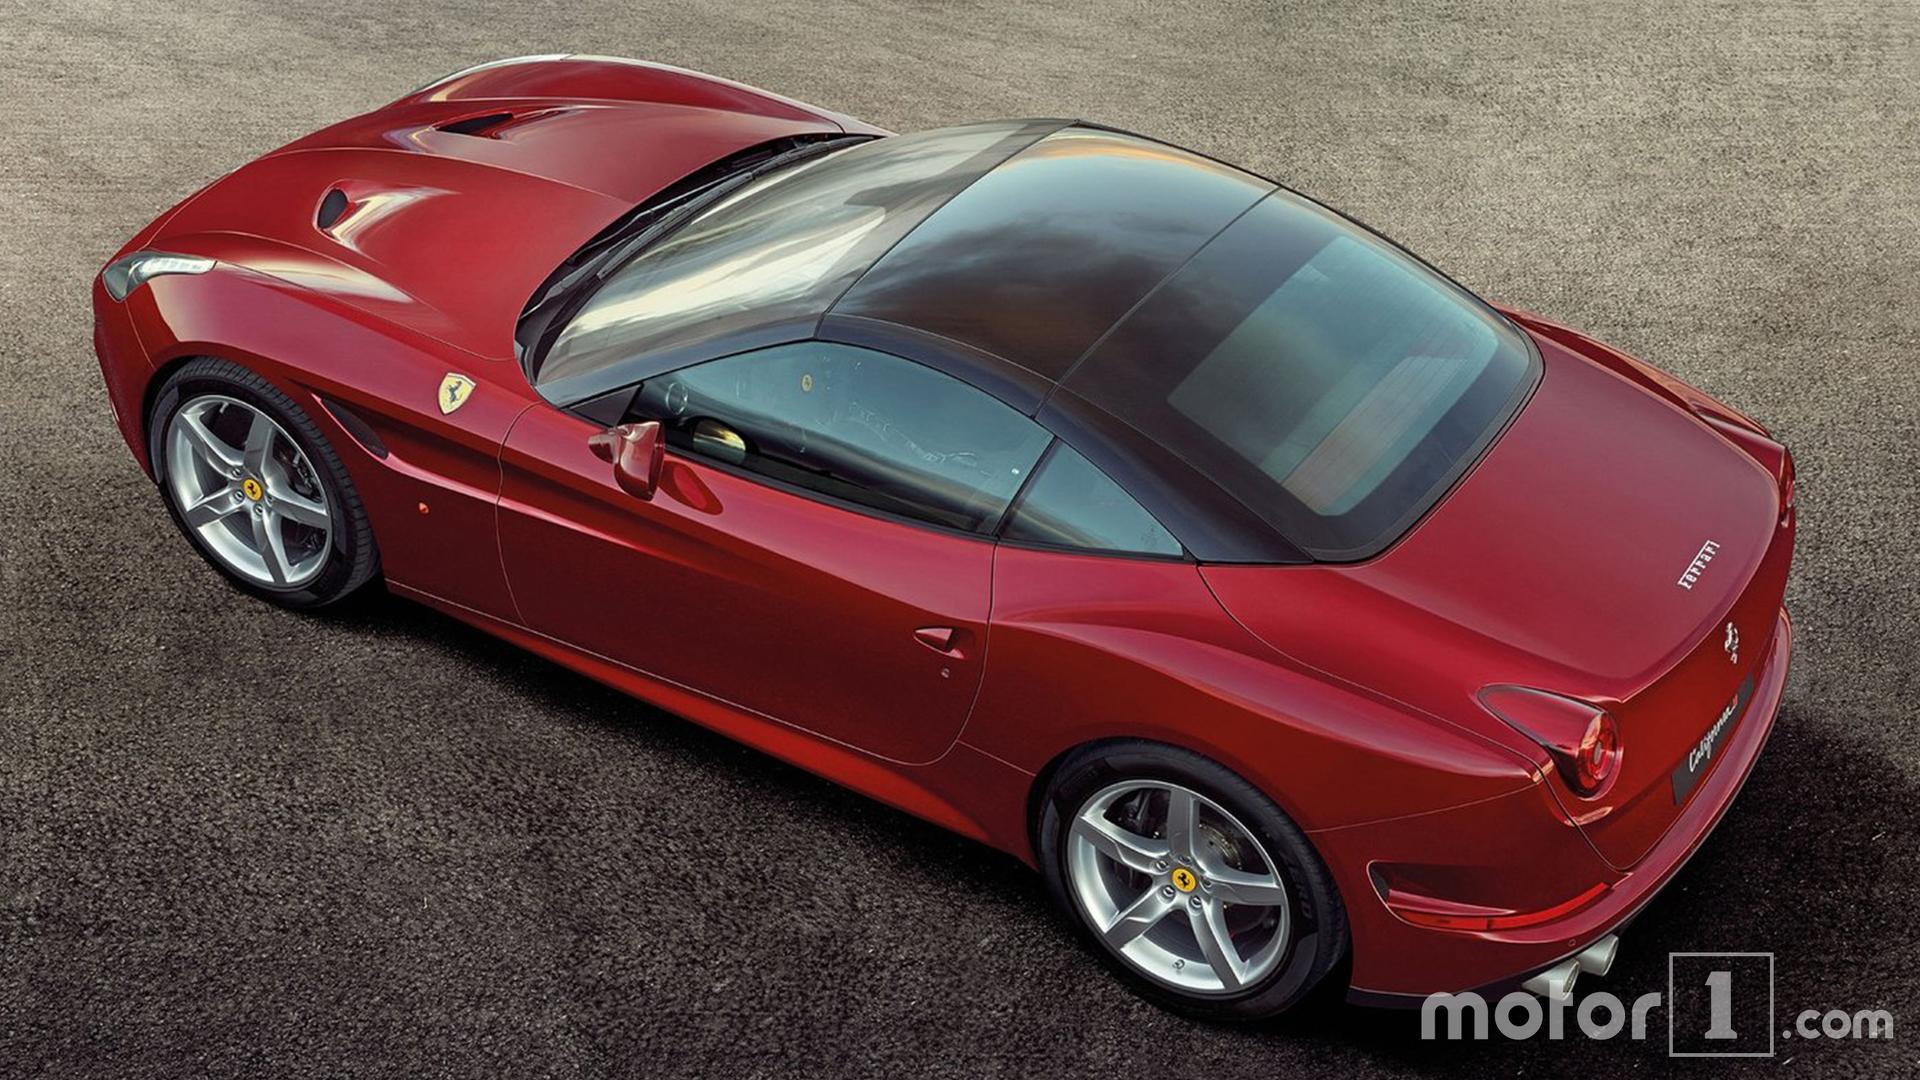 Ferrari Portofino Vs California T See The Changes Side By Side